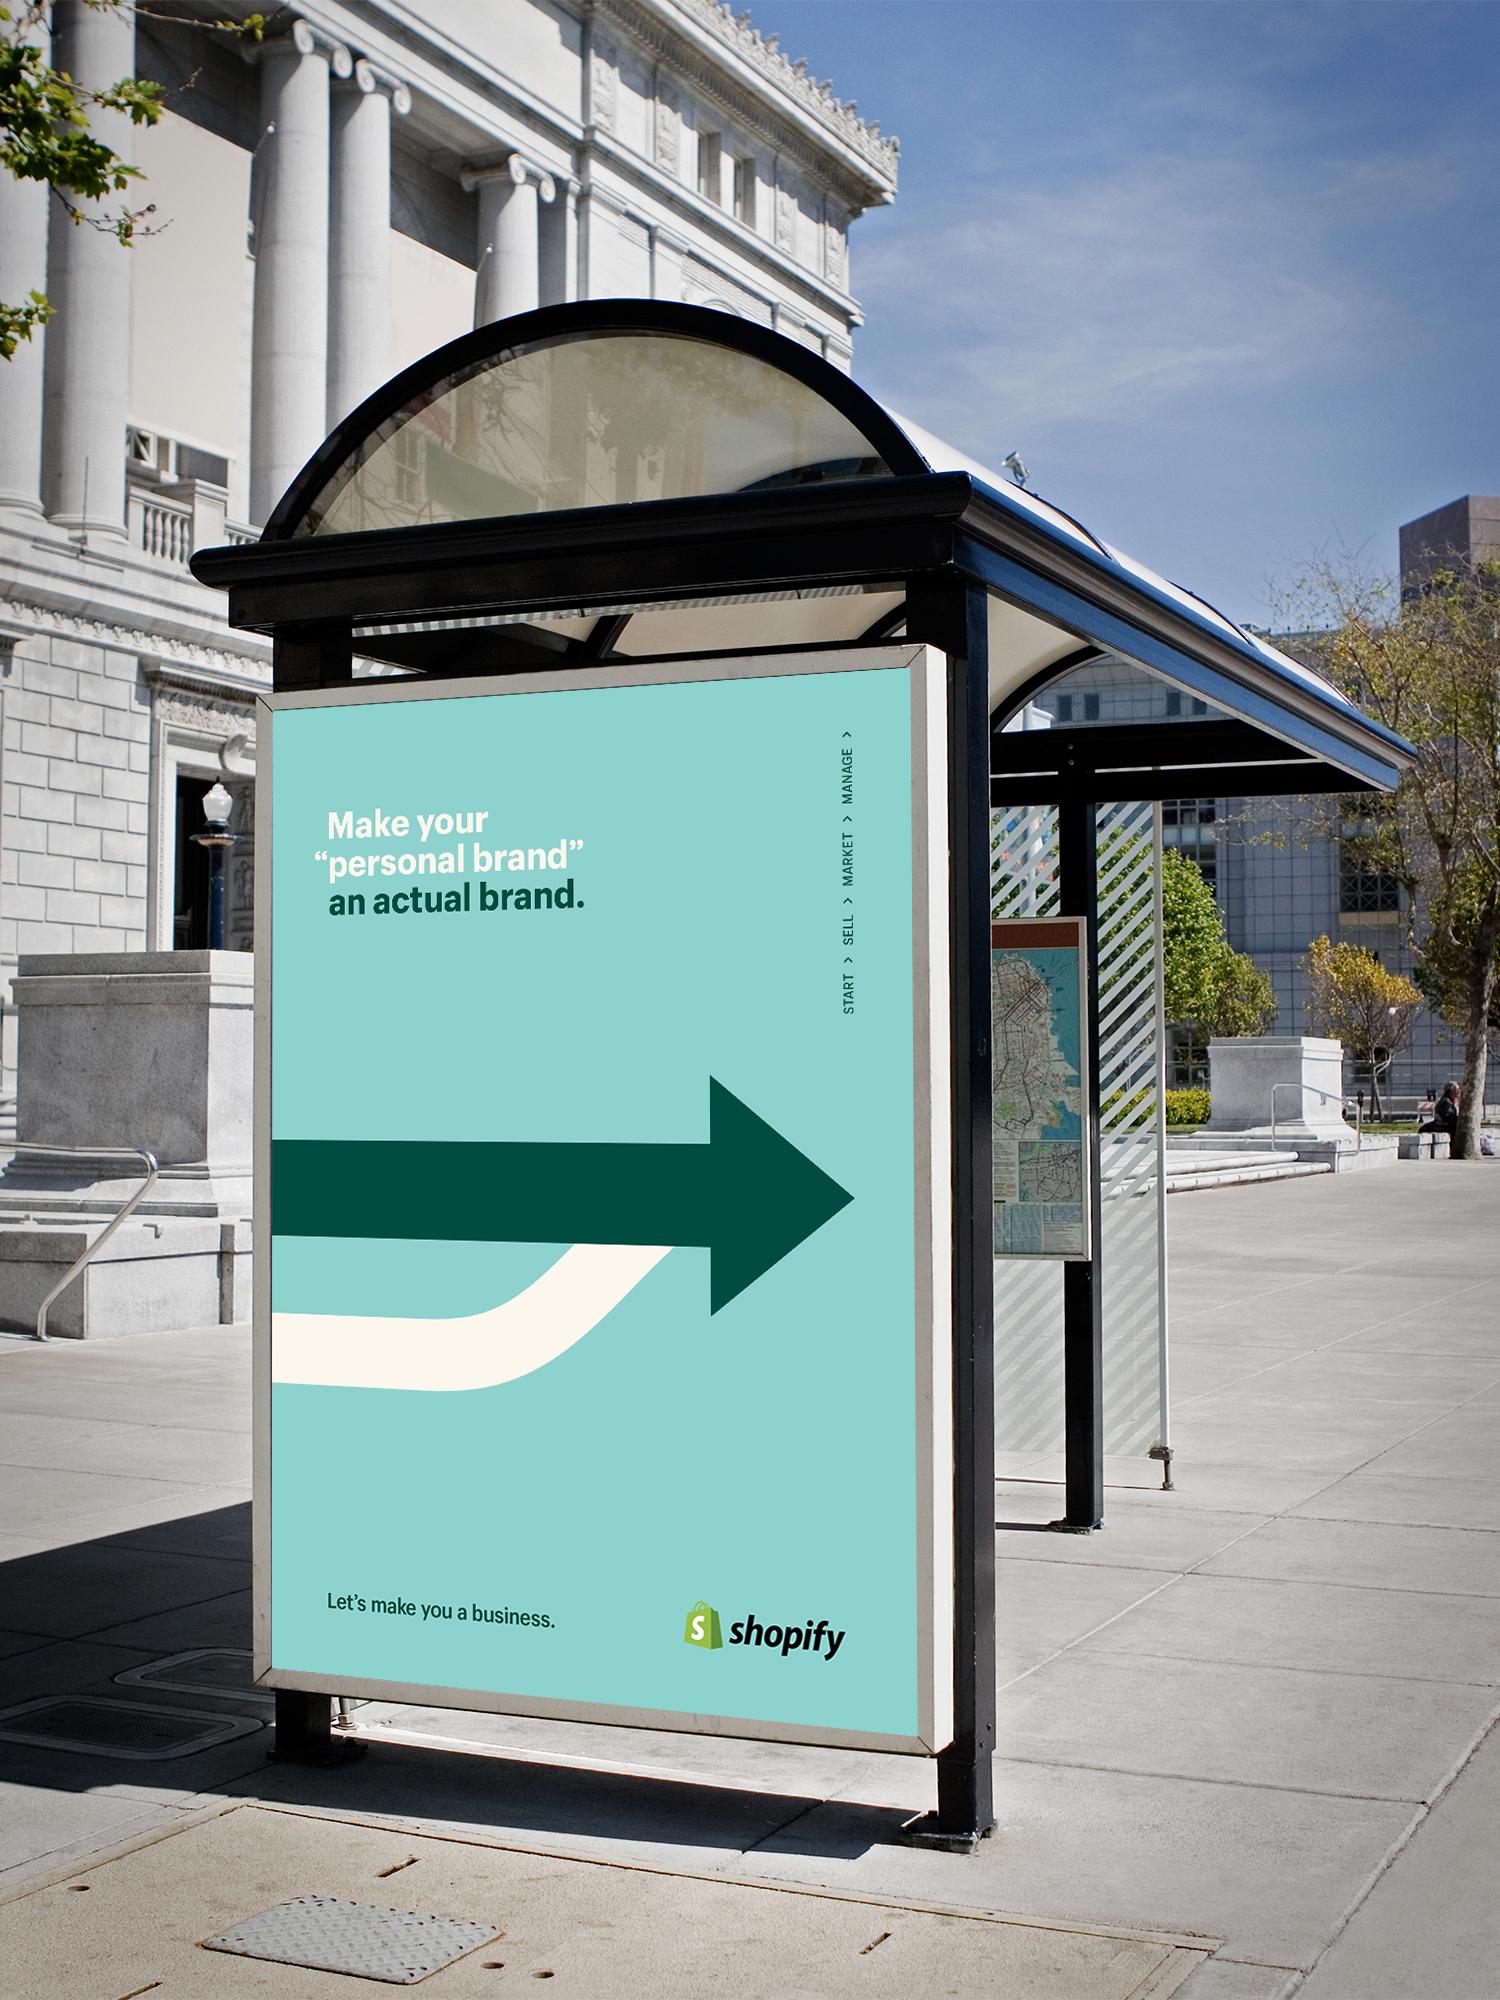 Shopify_Campaign_Rte_2_Billboard_03 (1).jpg